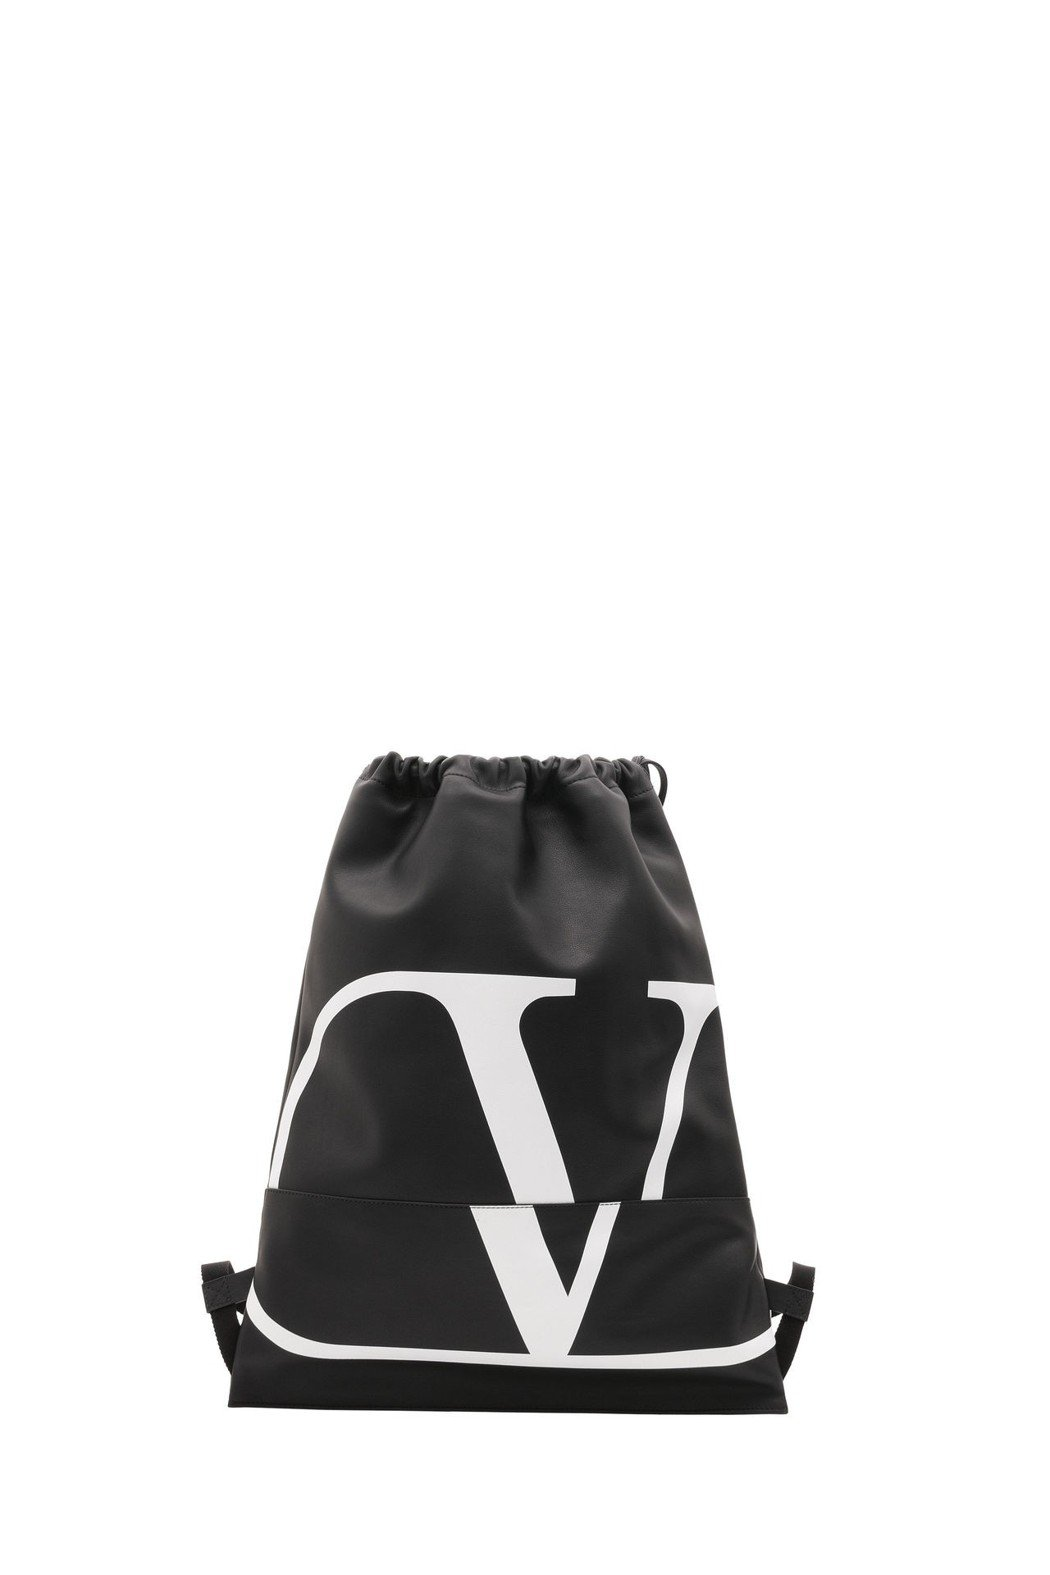 Valentino Garavani Go-logo 小牛皮後背包,NT$43,...